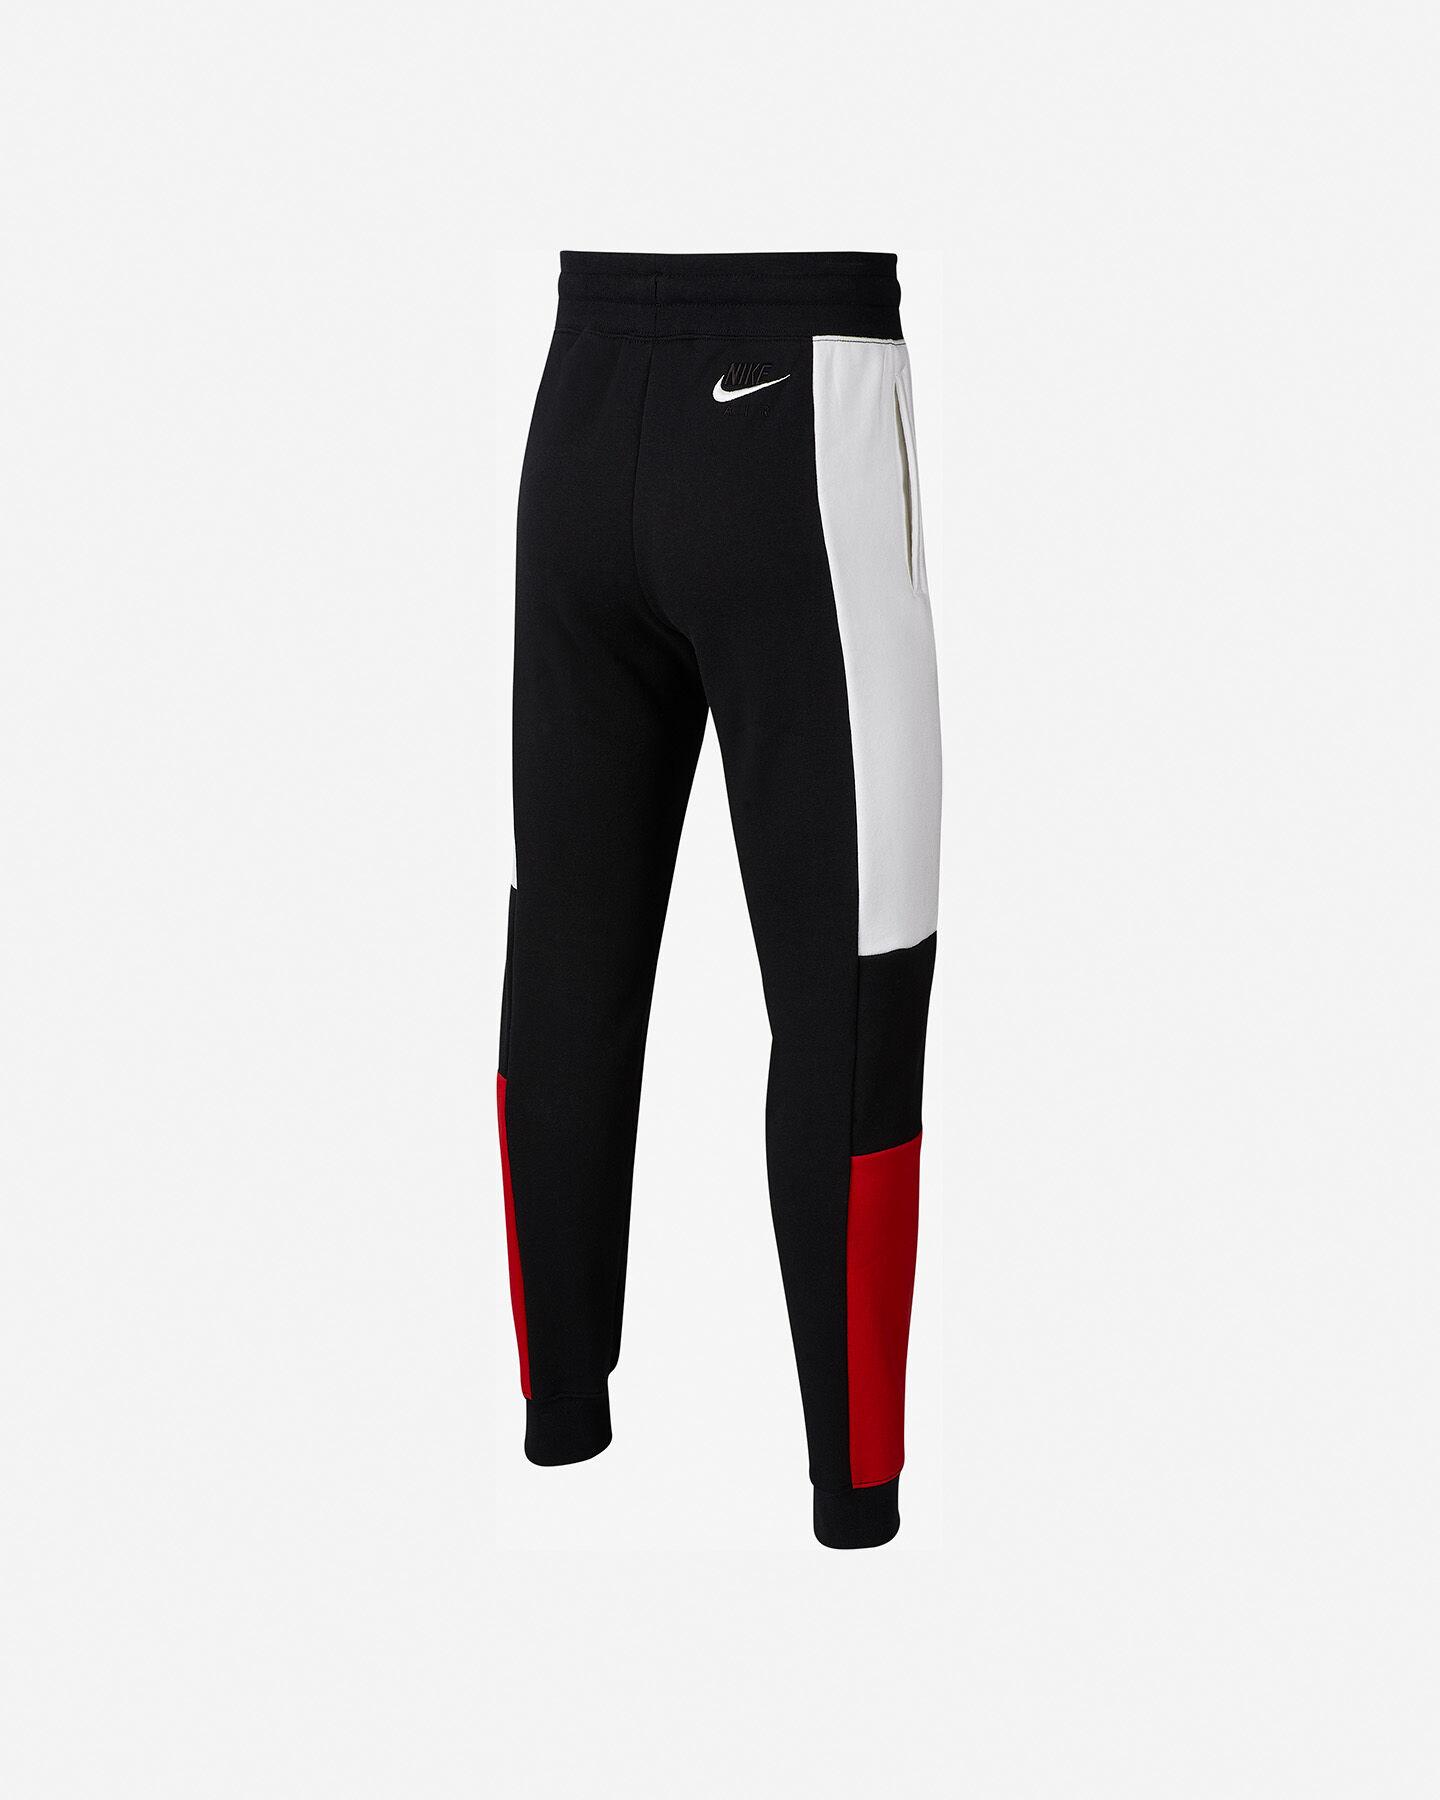 Pantalone NIKE AIR JR S5164586 scatto 1